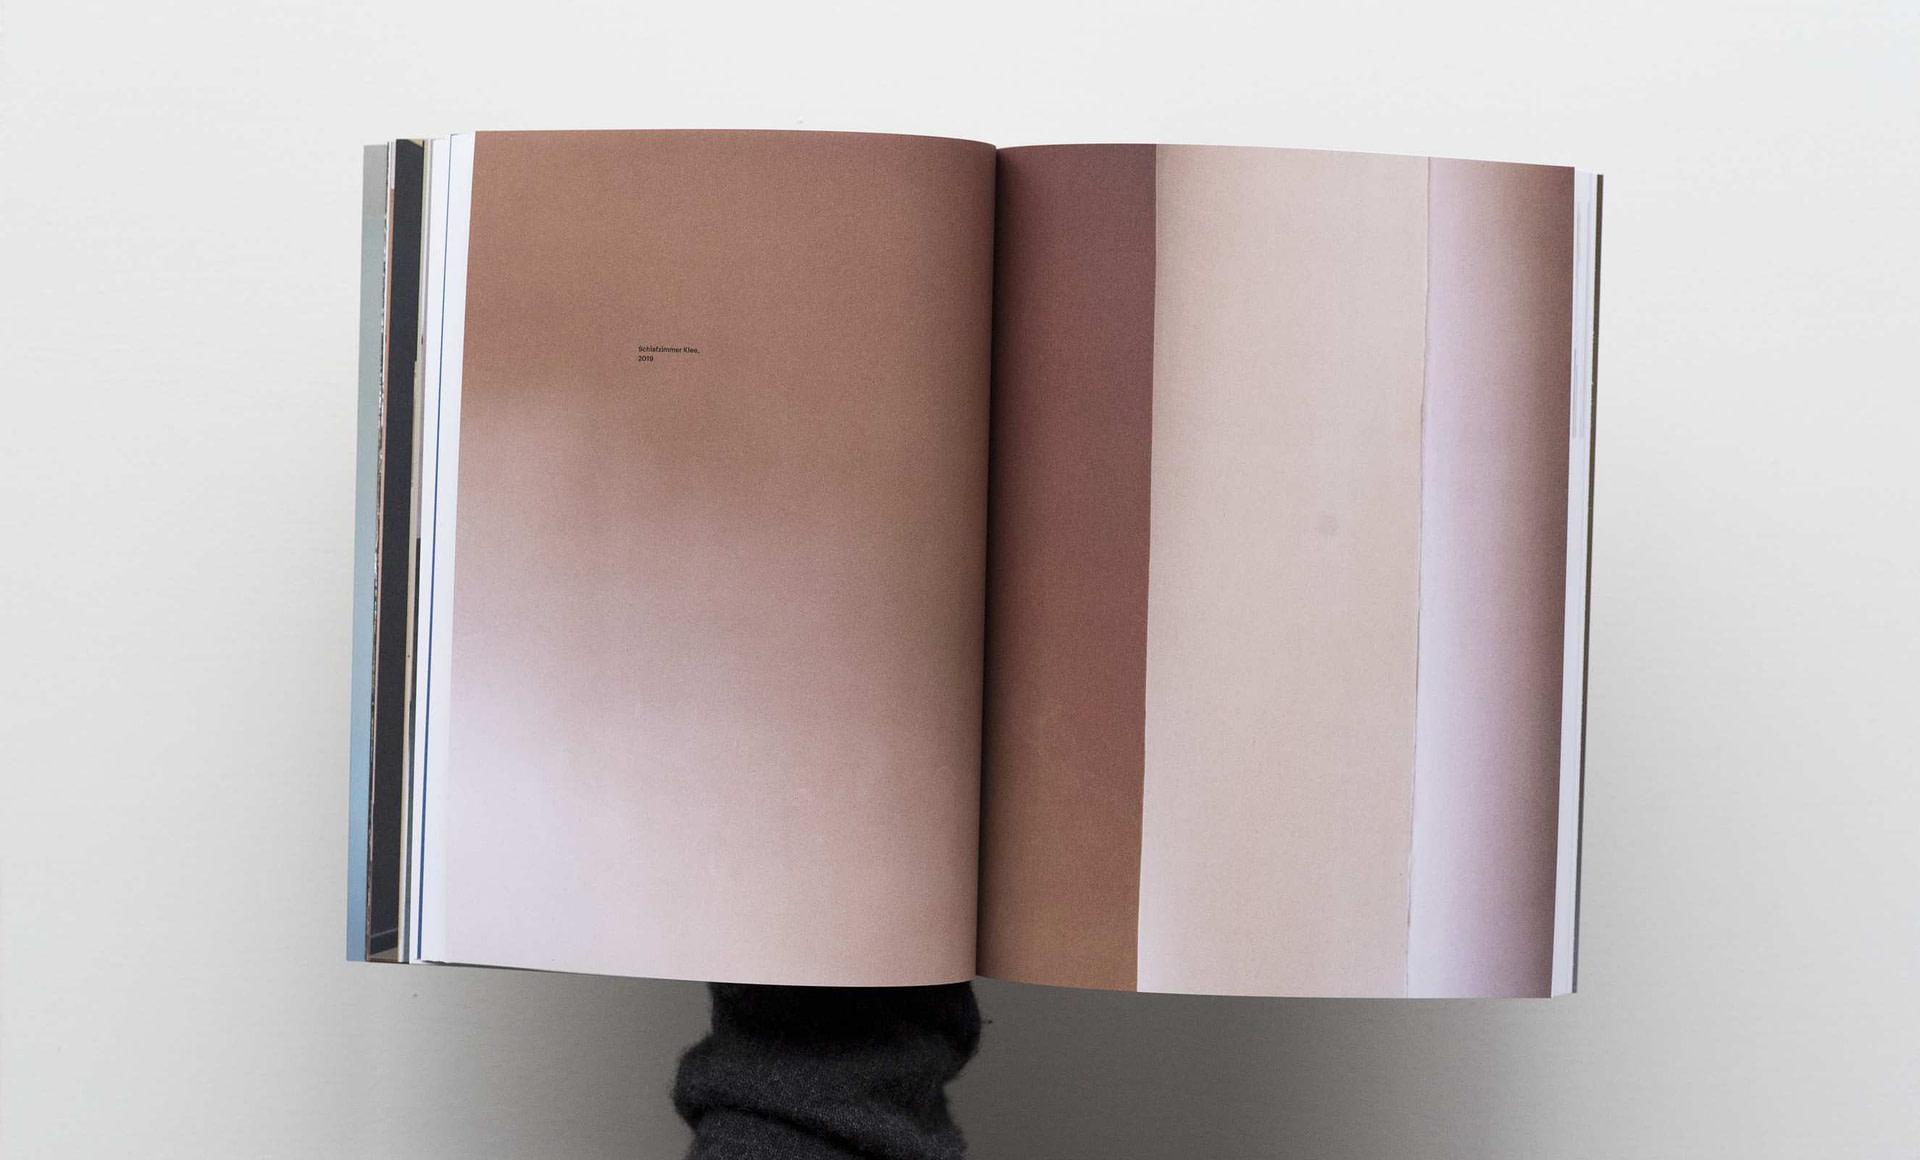 meisterhaus-kandinsky-klee-book-10-2650x1600px